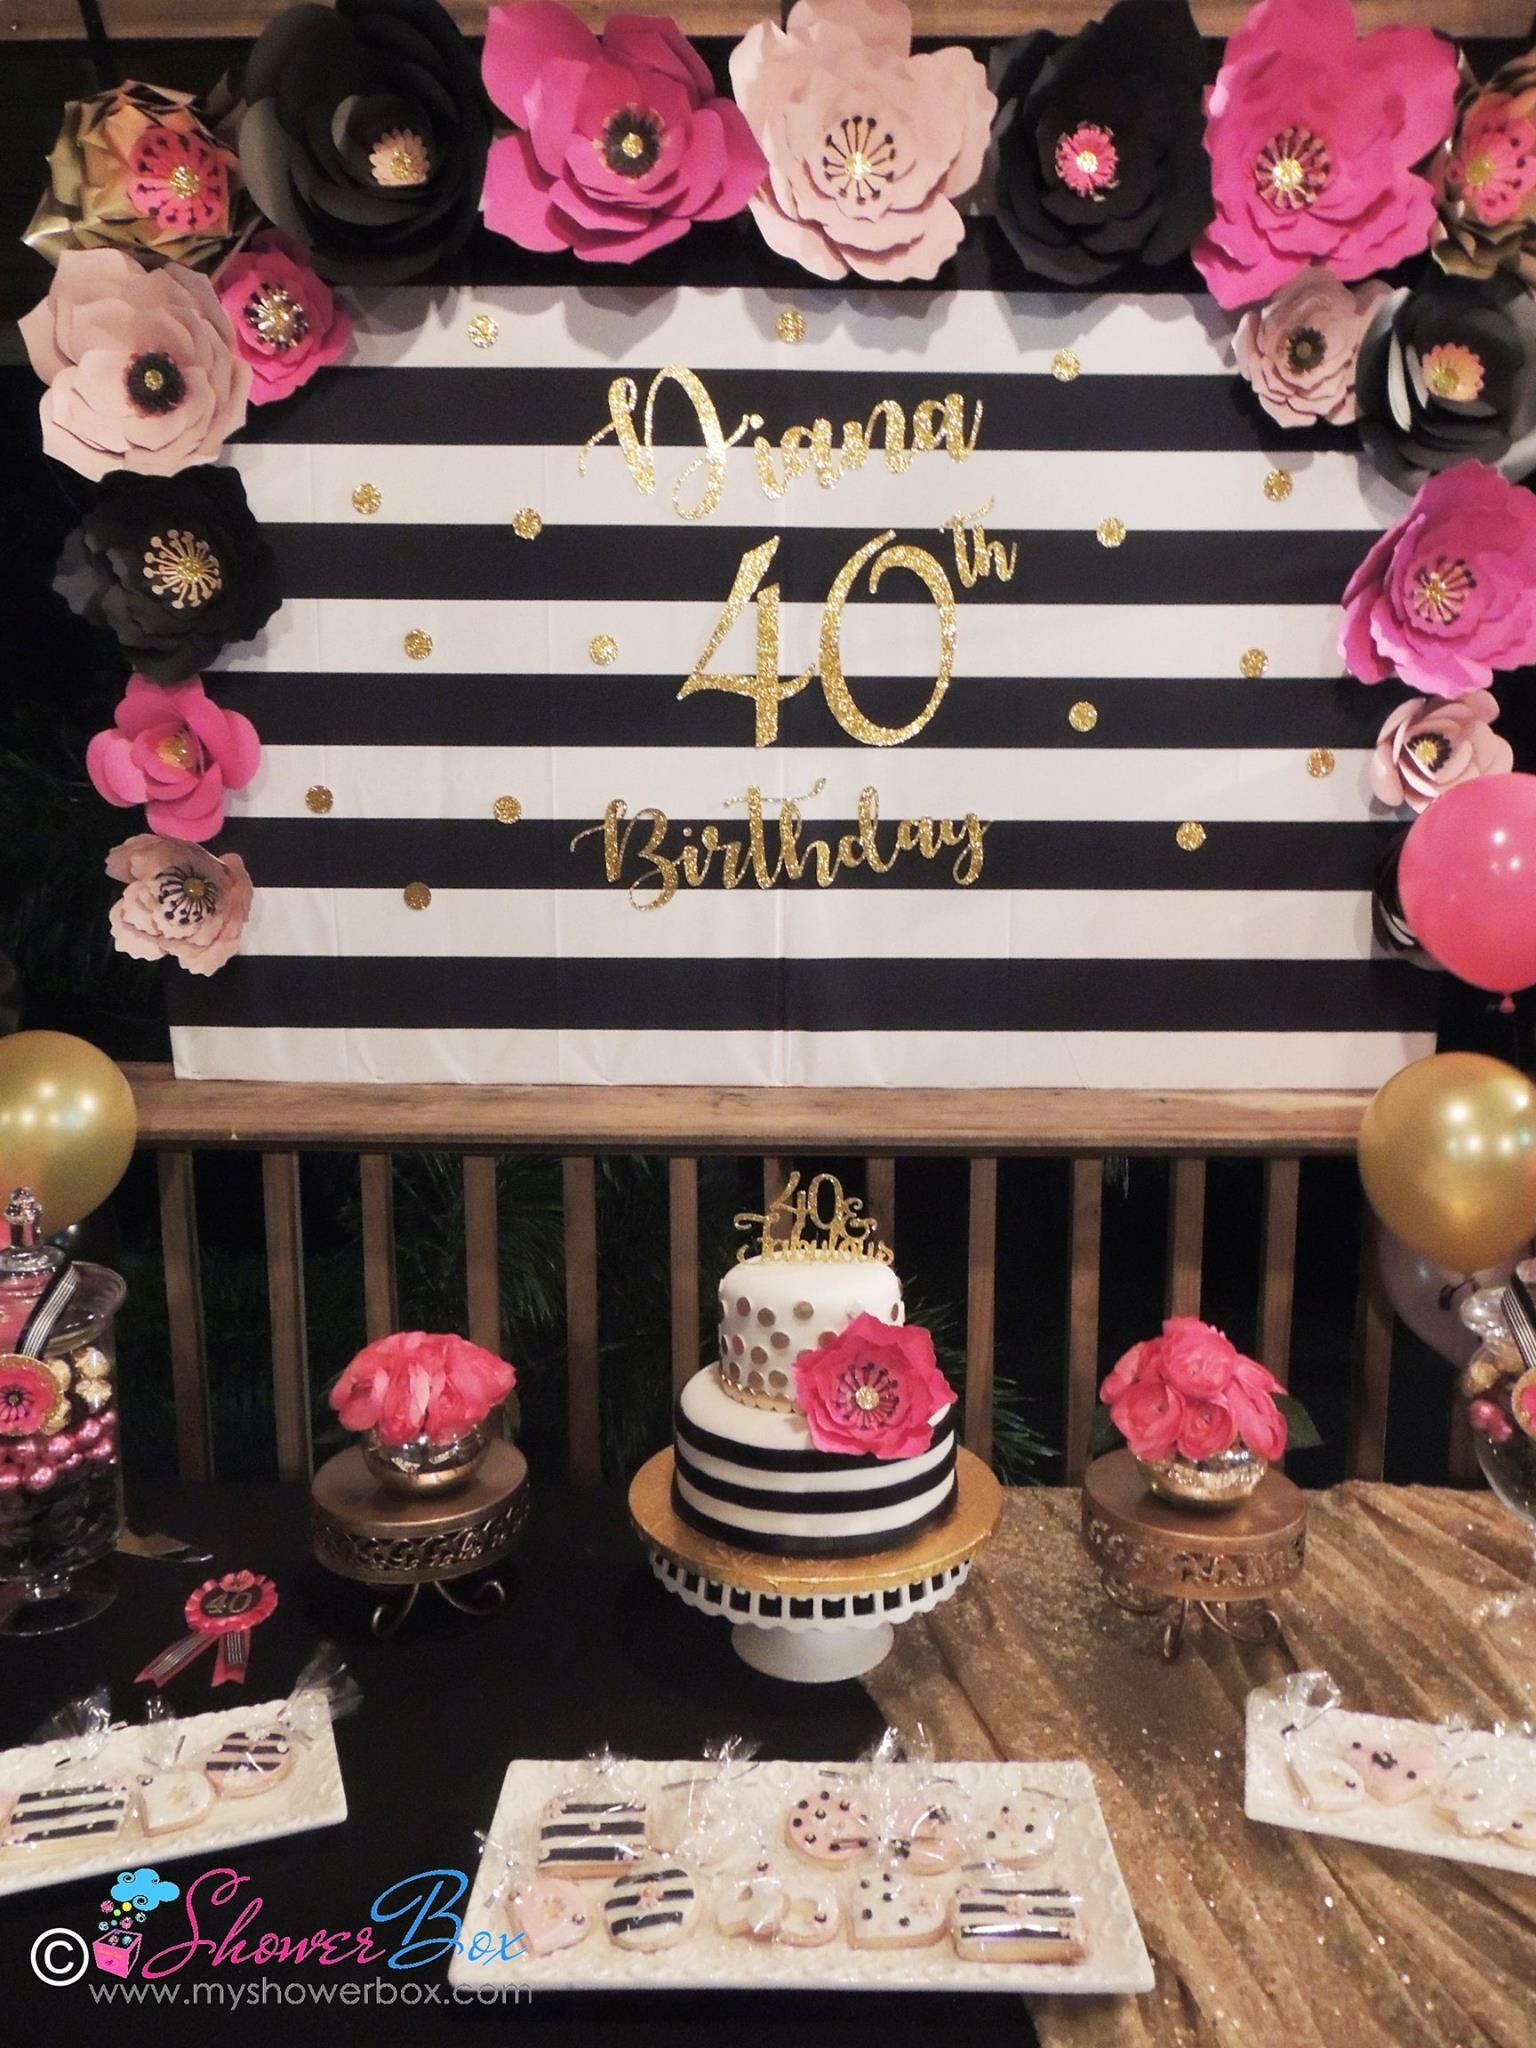 40th Birthday Showerbox Events 2017 Like Us On Fb Myshowerbox Showerboxdesigns Showe 40th Birthday Decorations Birthday Surprise Party Birthday Decorations [ 2048 x 1536 Pixel ]